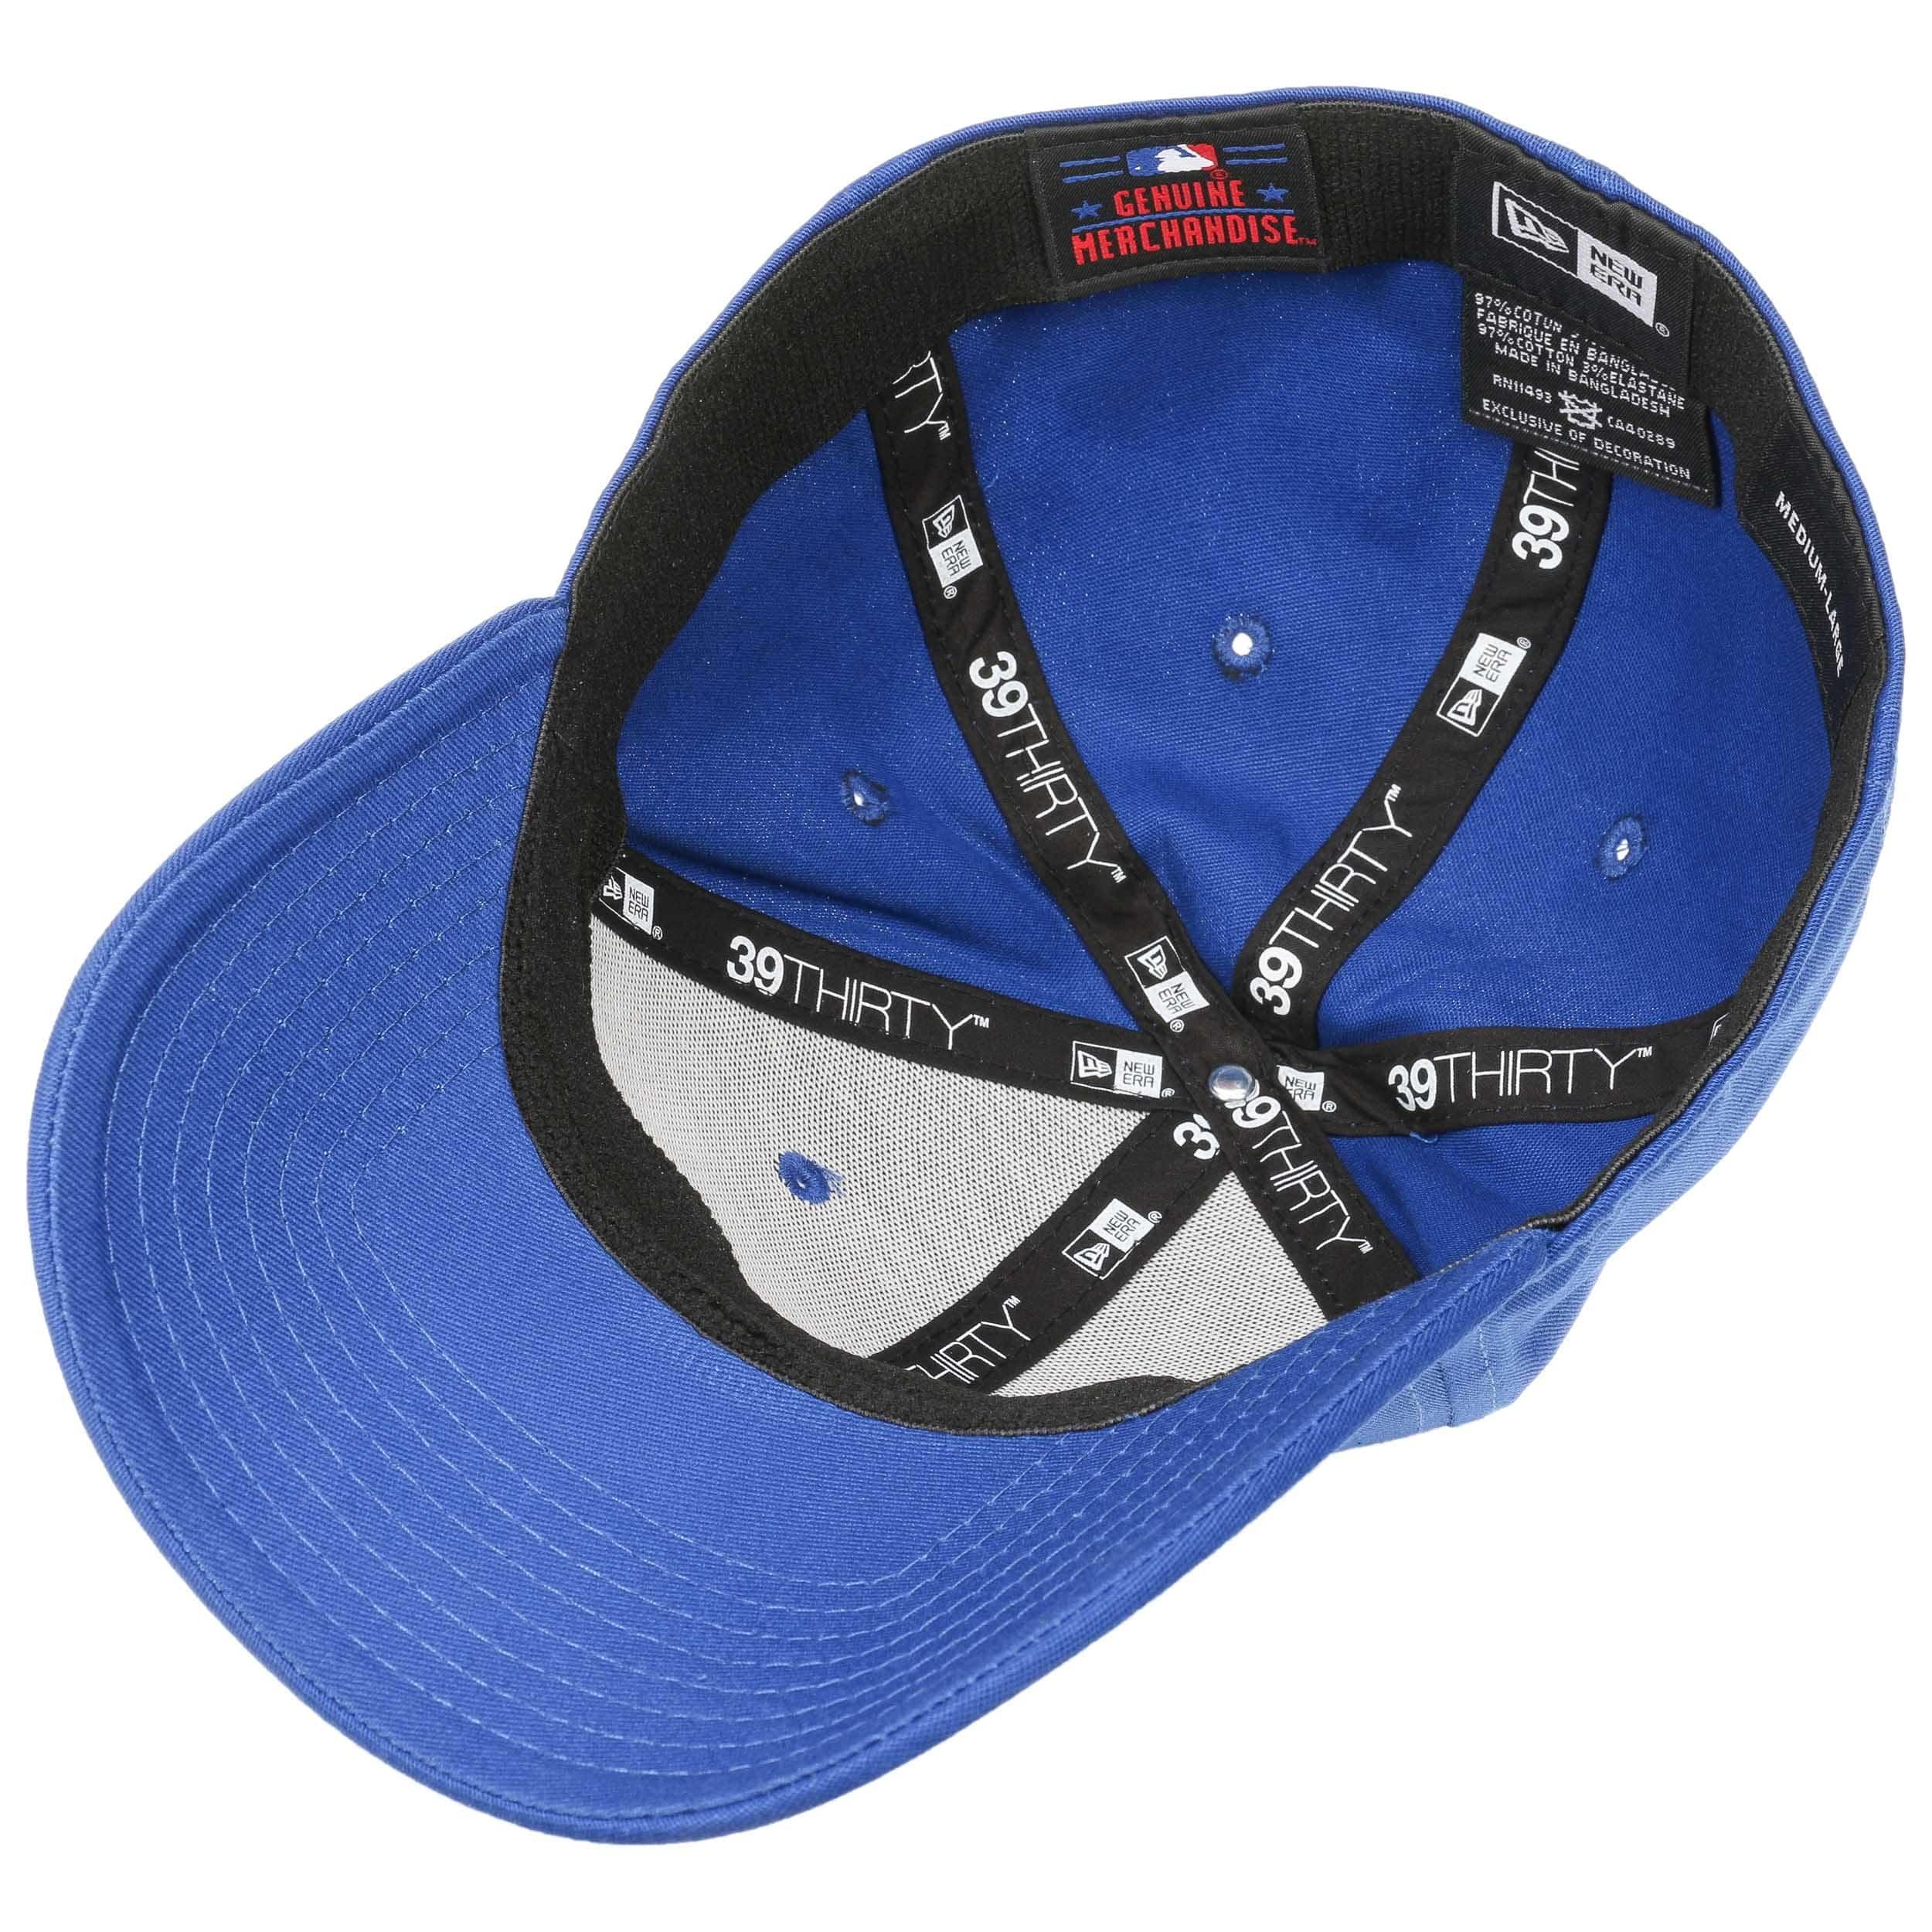 bb89edb03f72f Gorra 39Thirty League Yankees by New Era - Gorras - sombreroshop.es